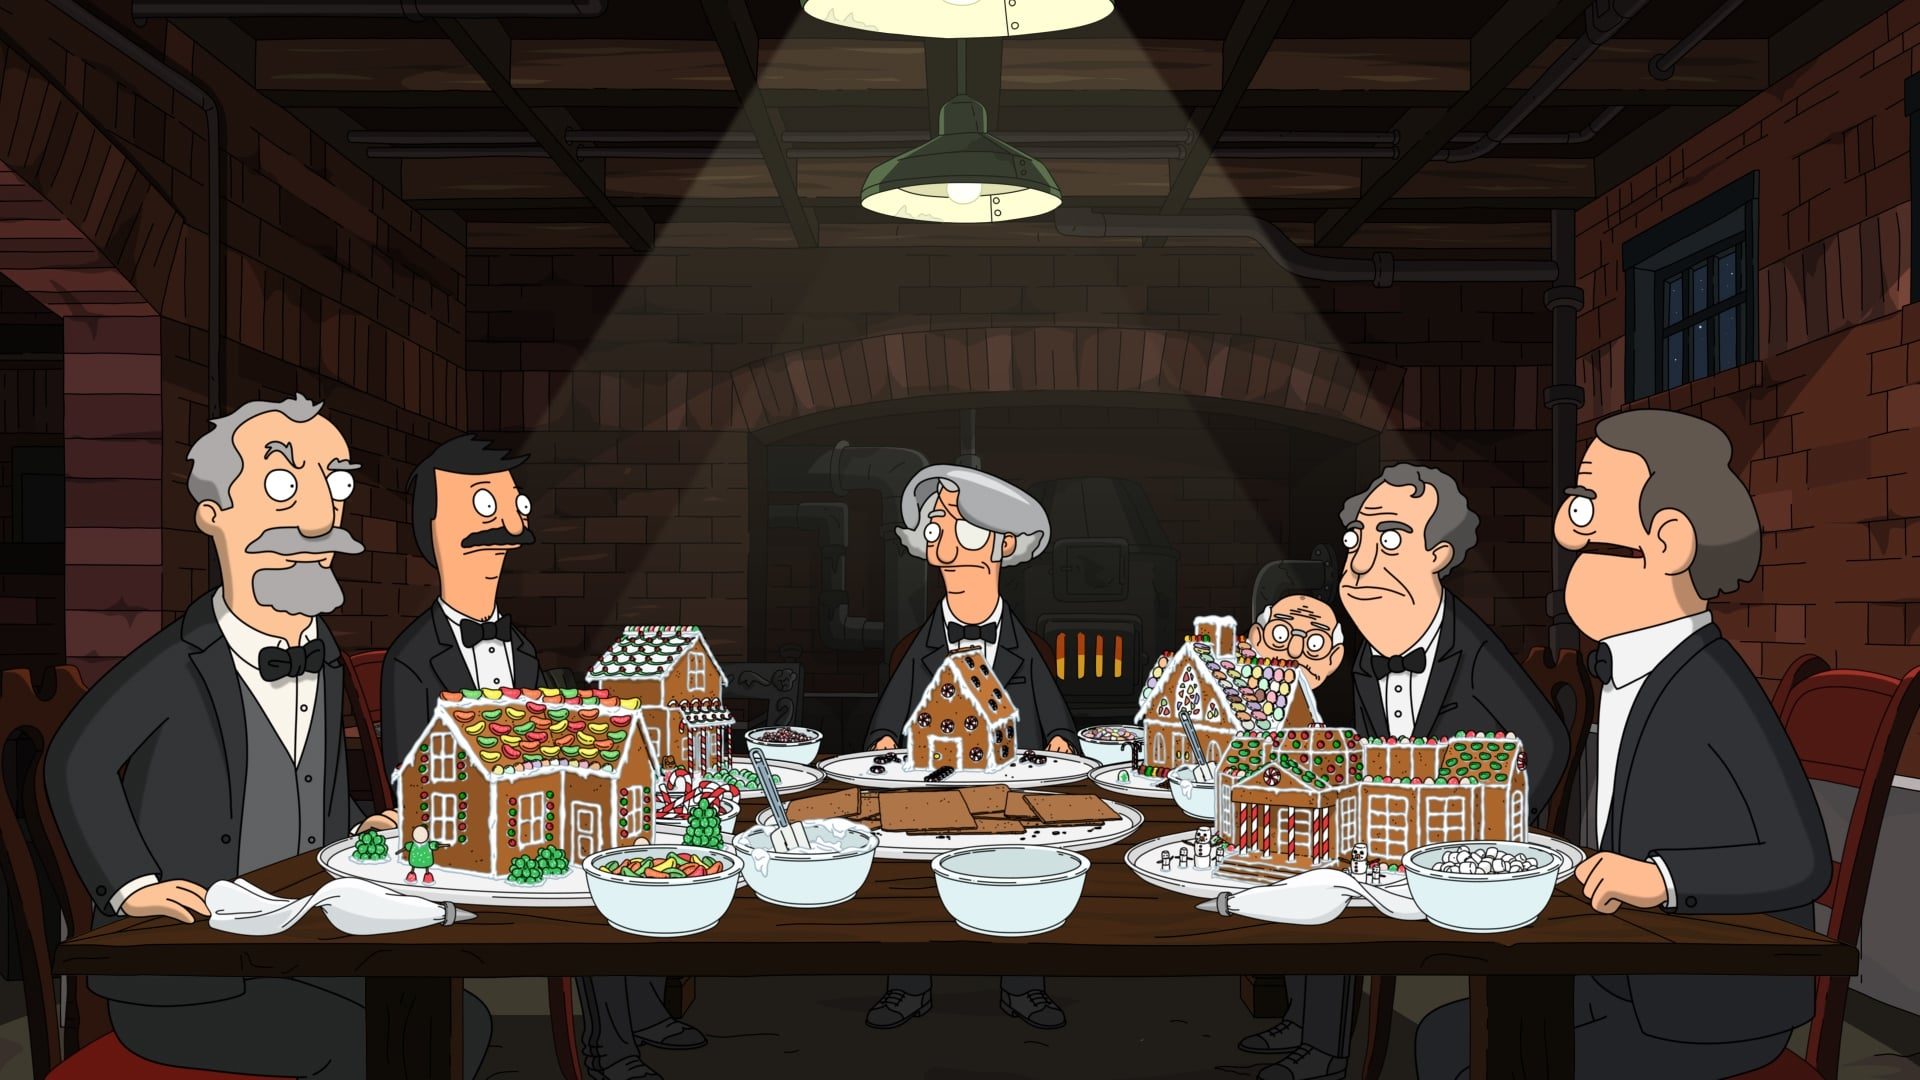 Bob's Burgers - Season 7 Episode 7 : The Last Gingerbread House on the Left